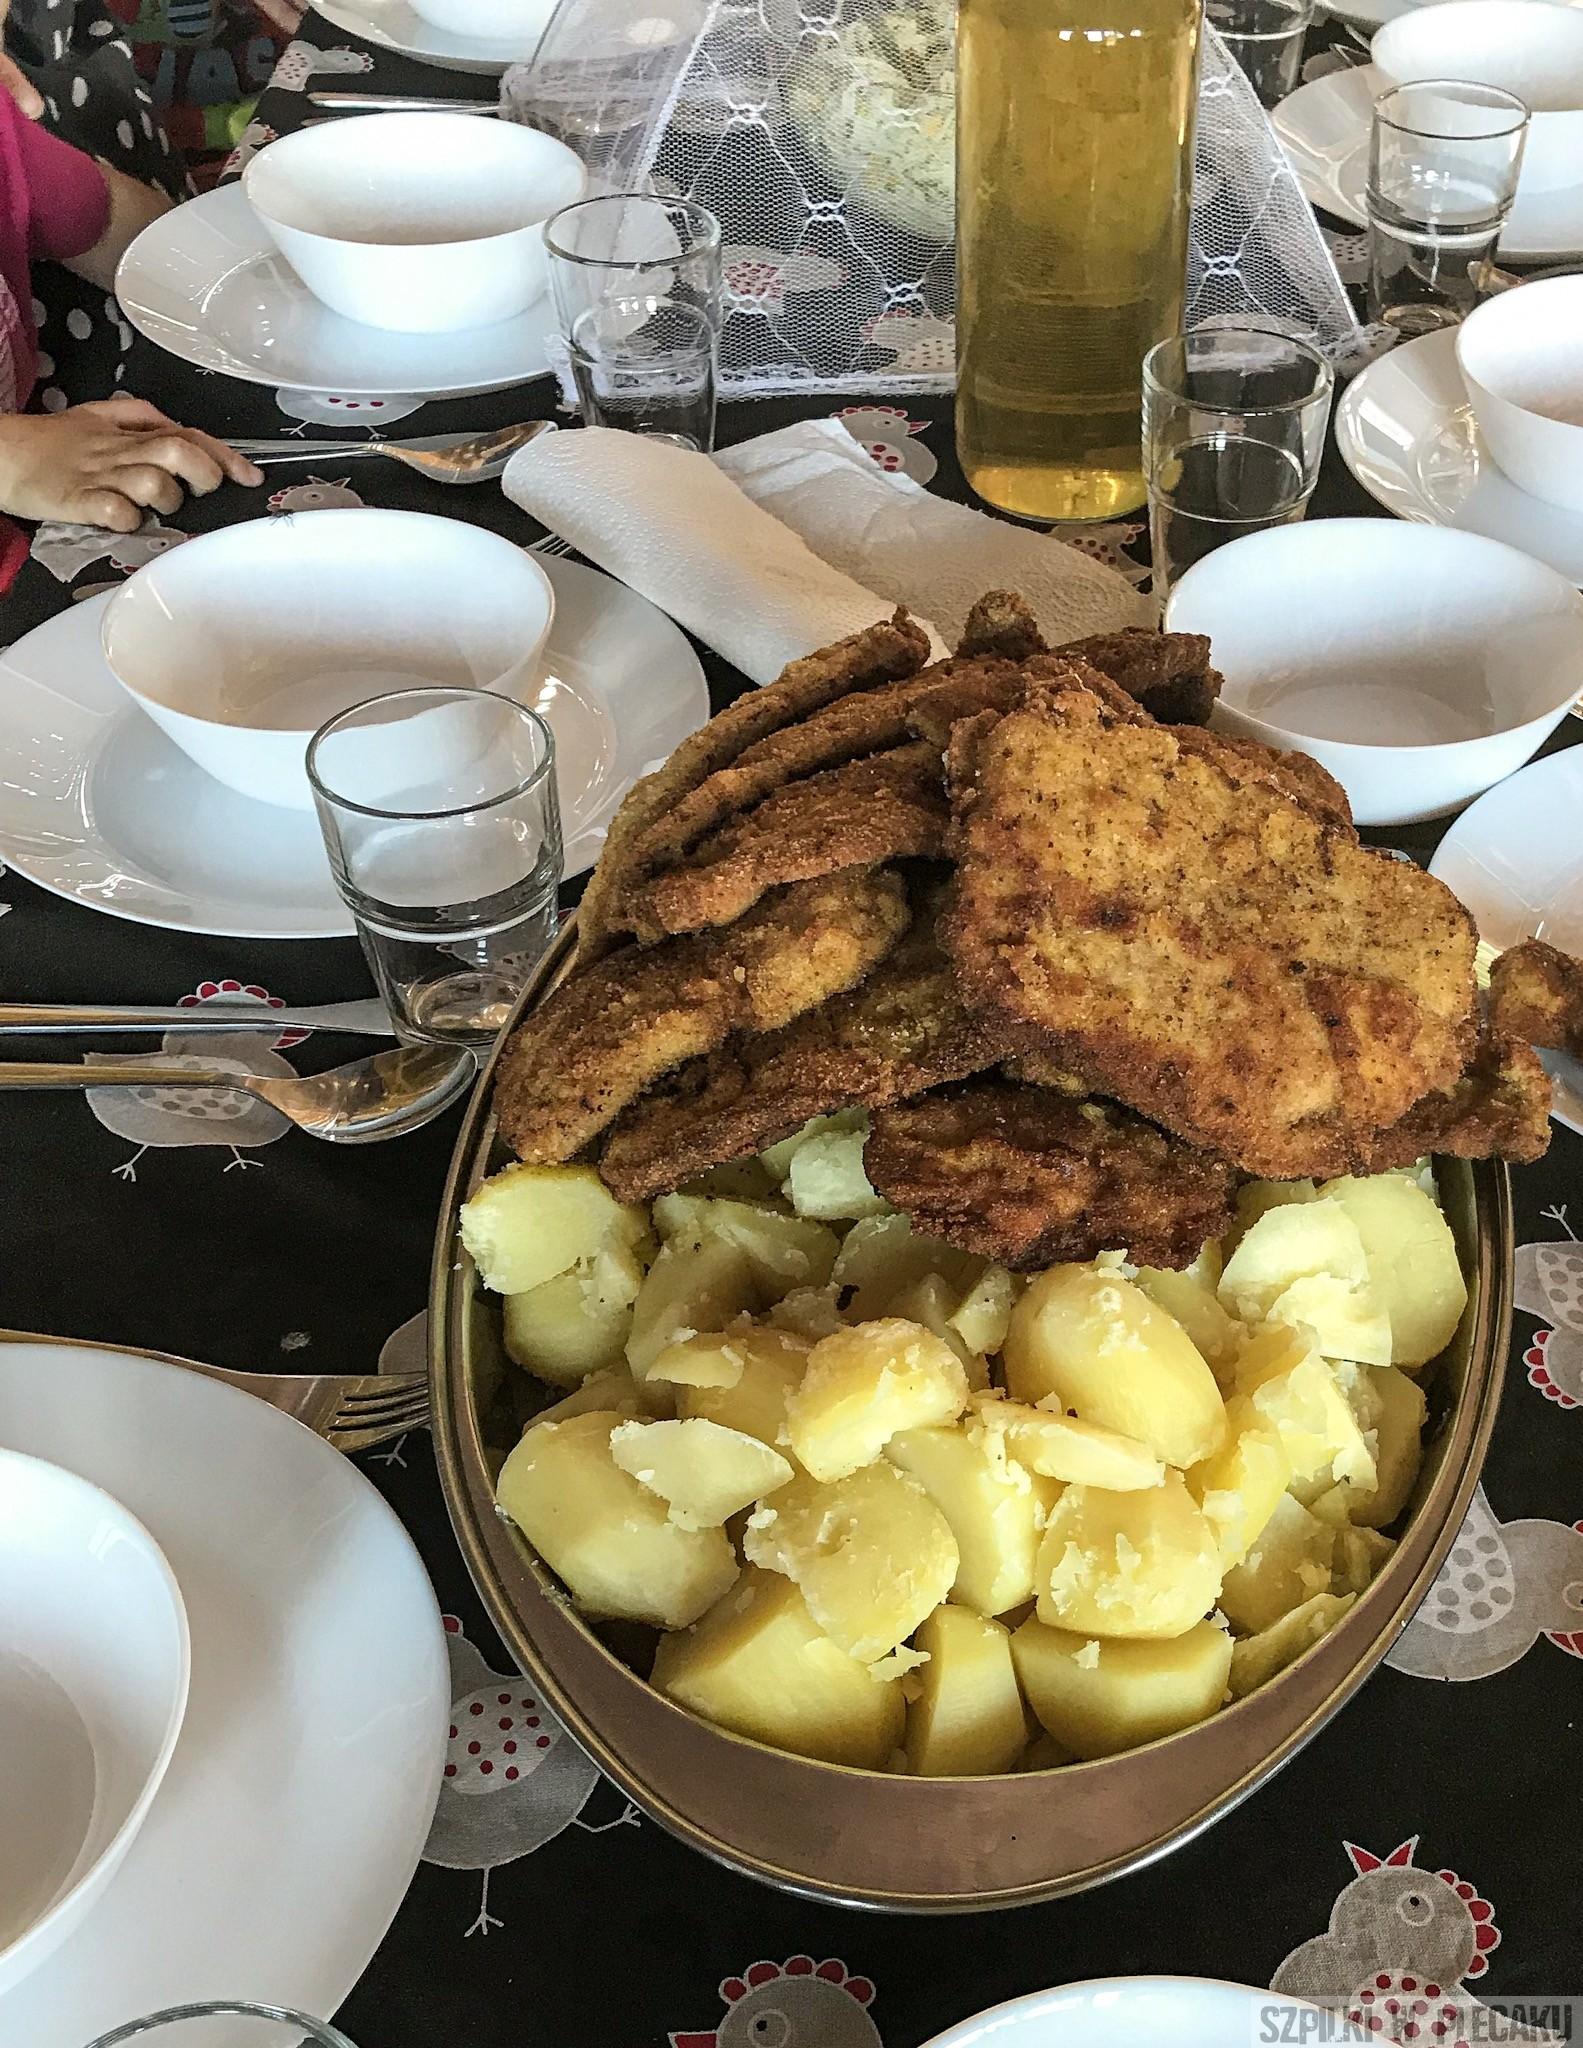 obiad - Siedlisko Leluja